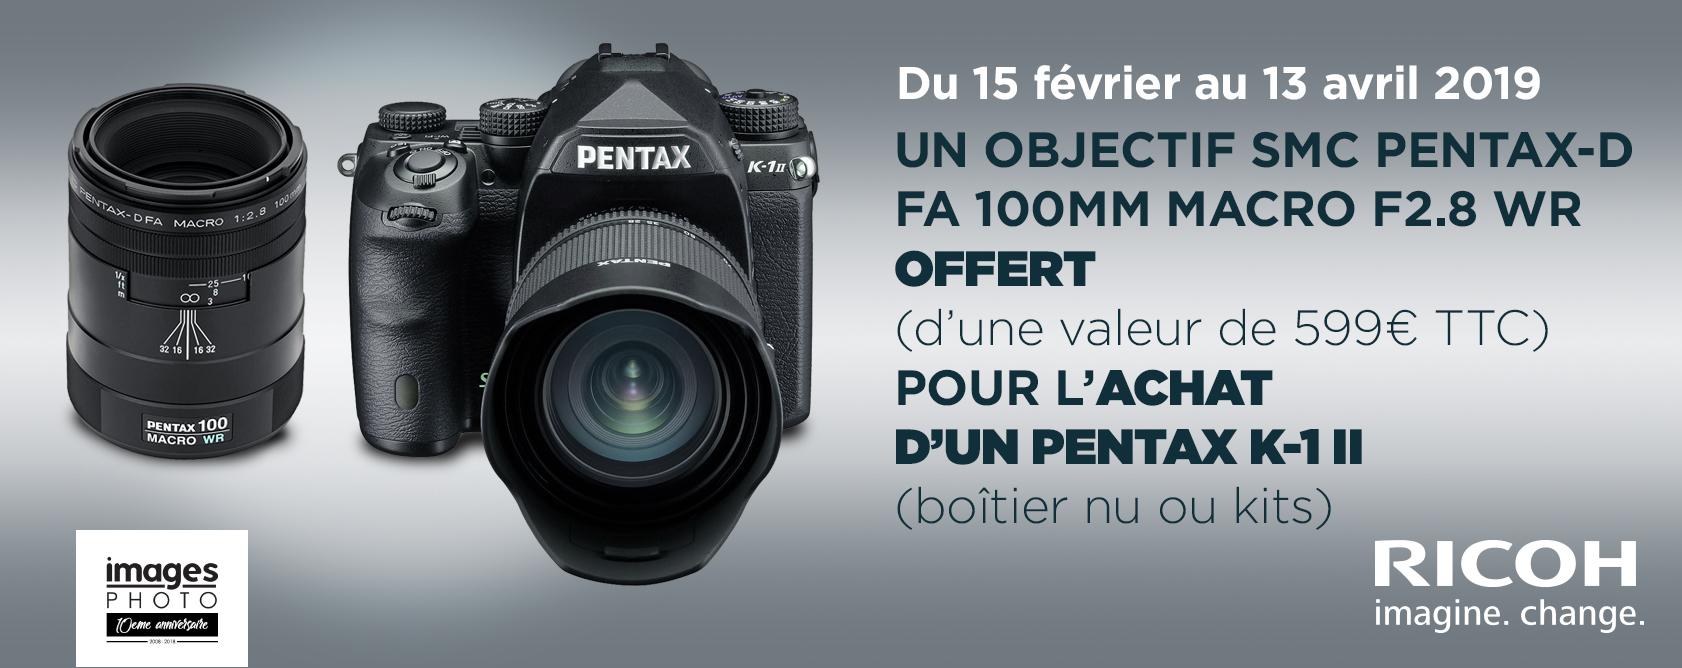 Ricoh Pentax K1II 13 avril